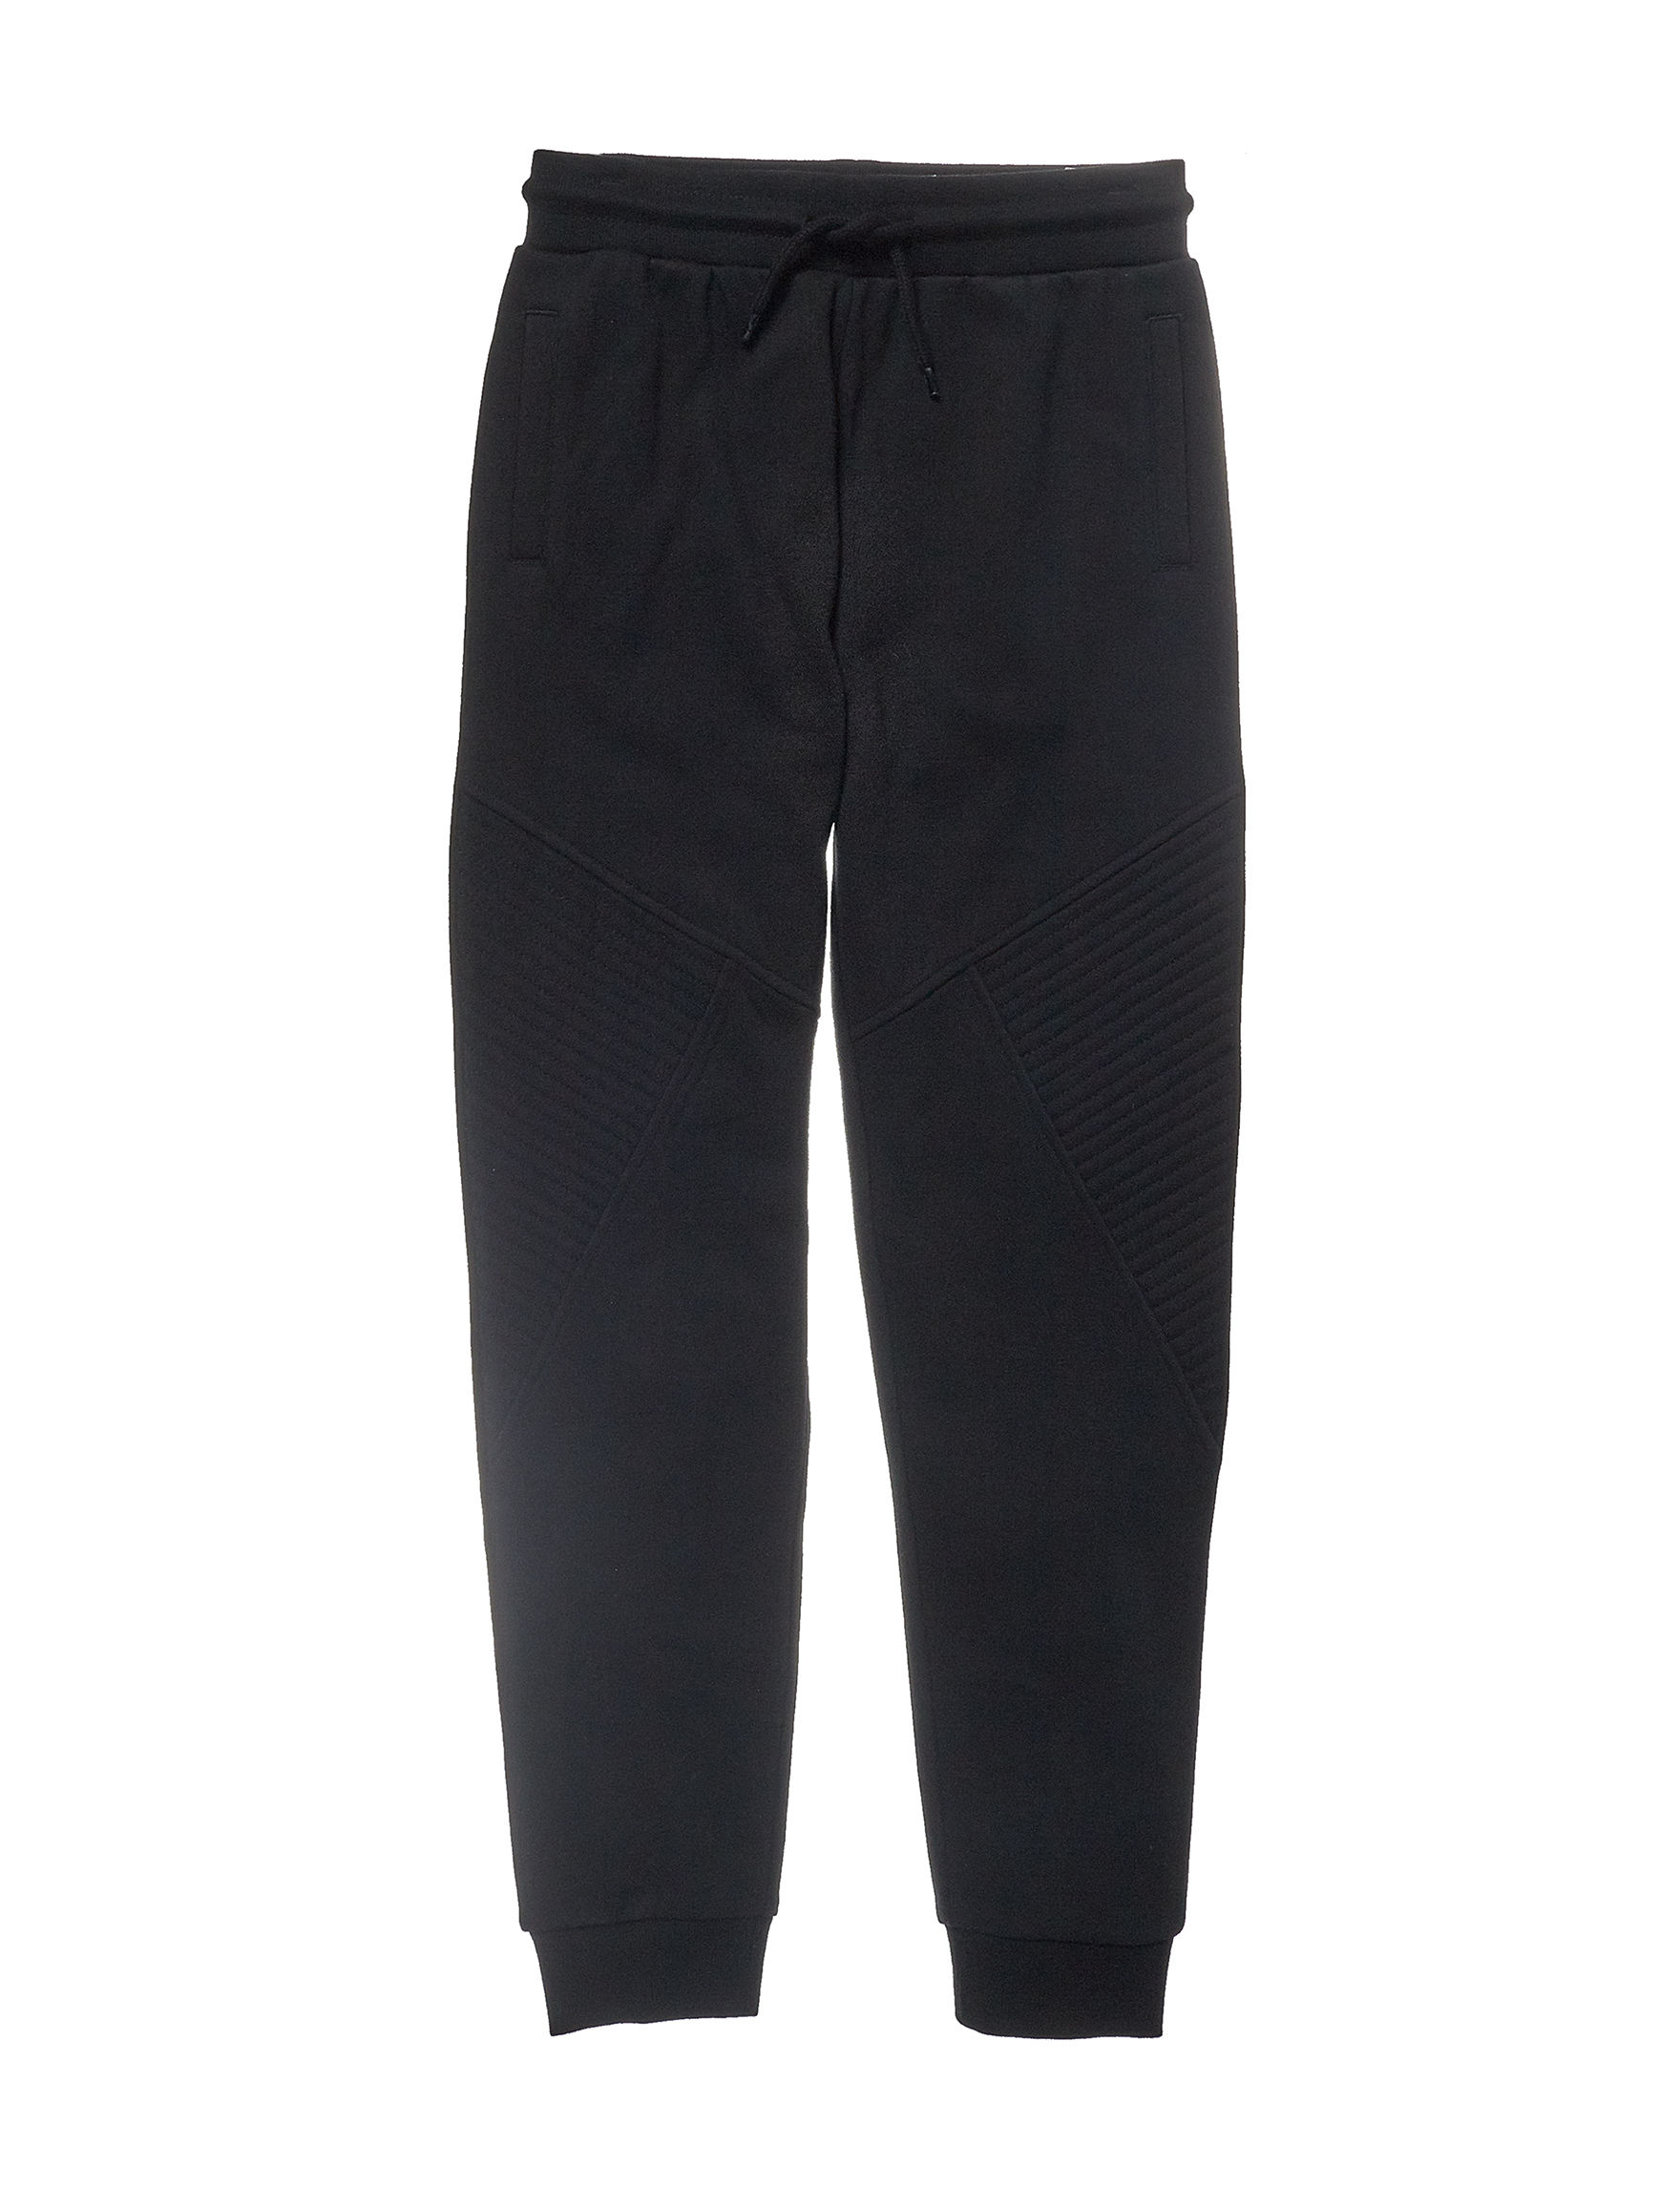 Hollywood Jeans Black Slim